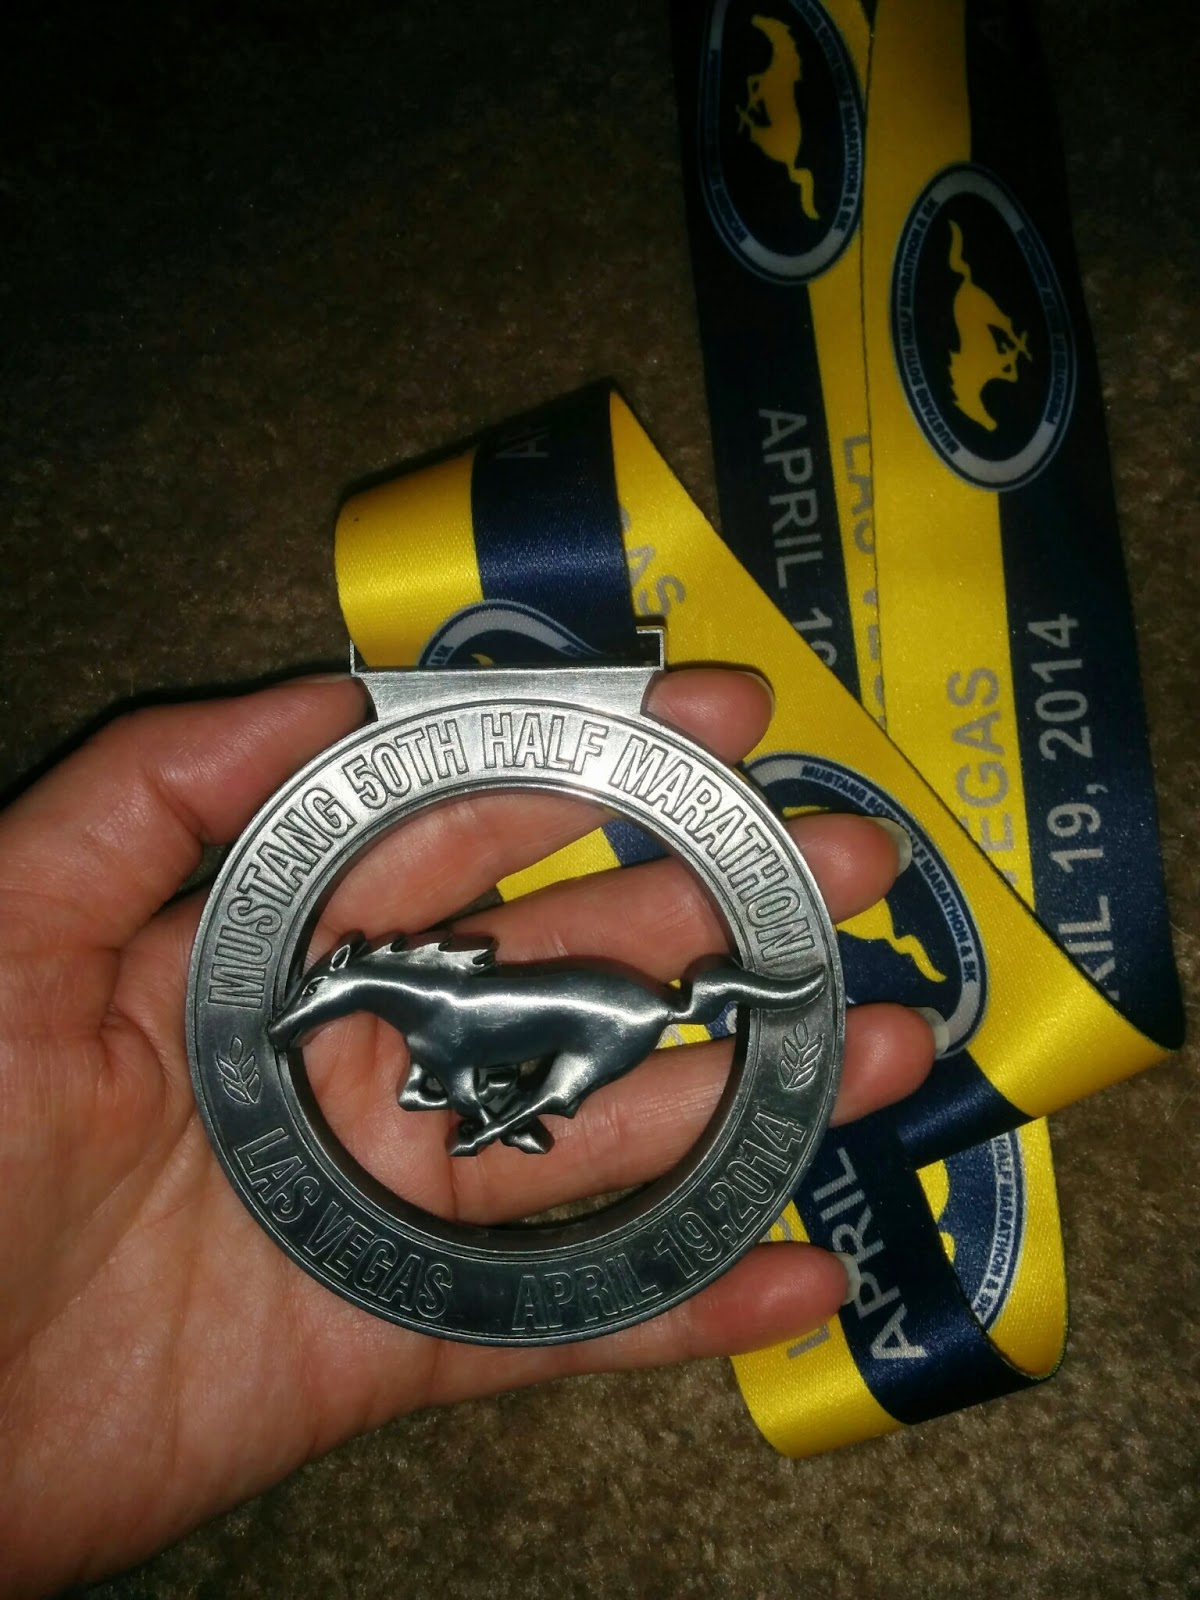 Mustang 50th Half Marathon Recap